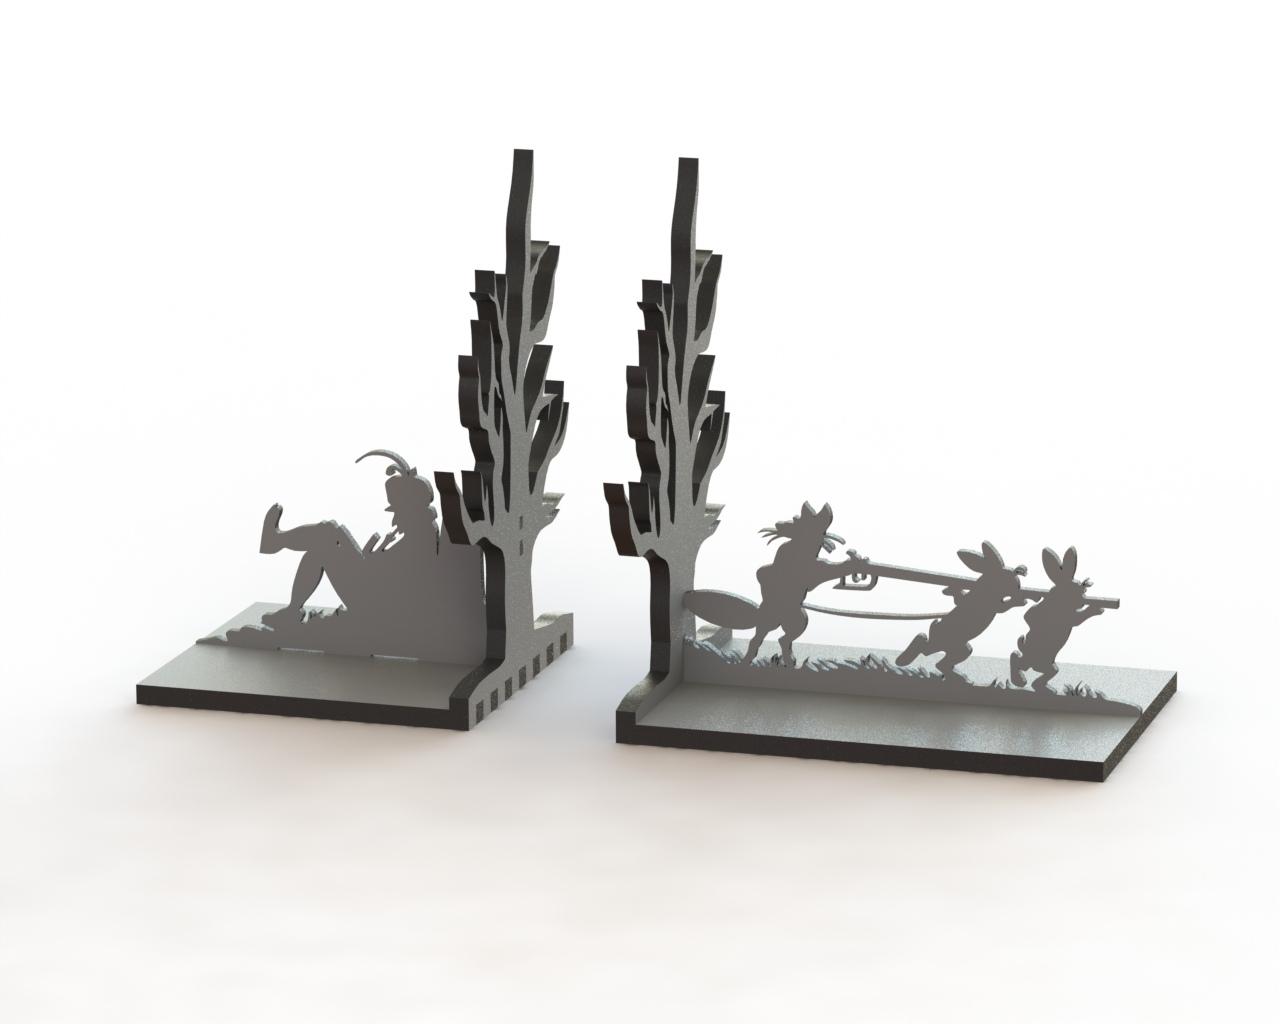 Laser Cut Fable Book Holder 3d Puzzle Free CDR Vectors Art